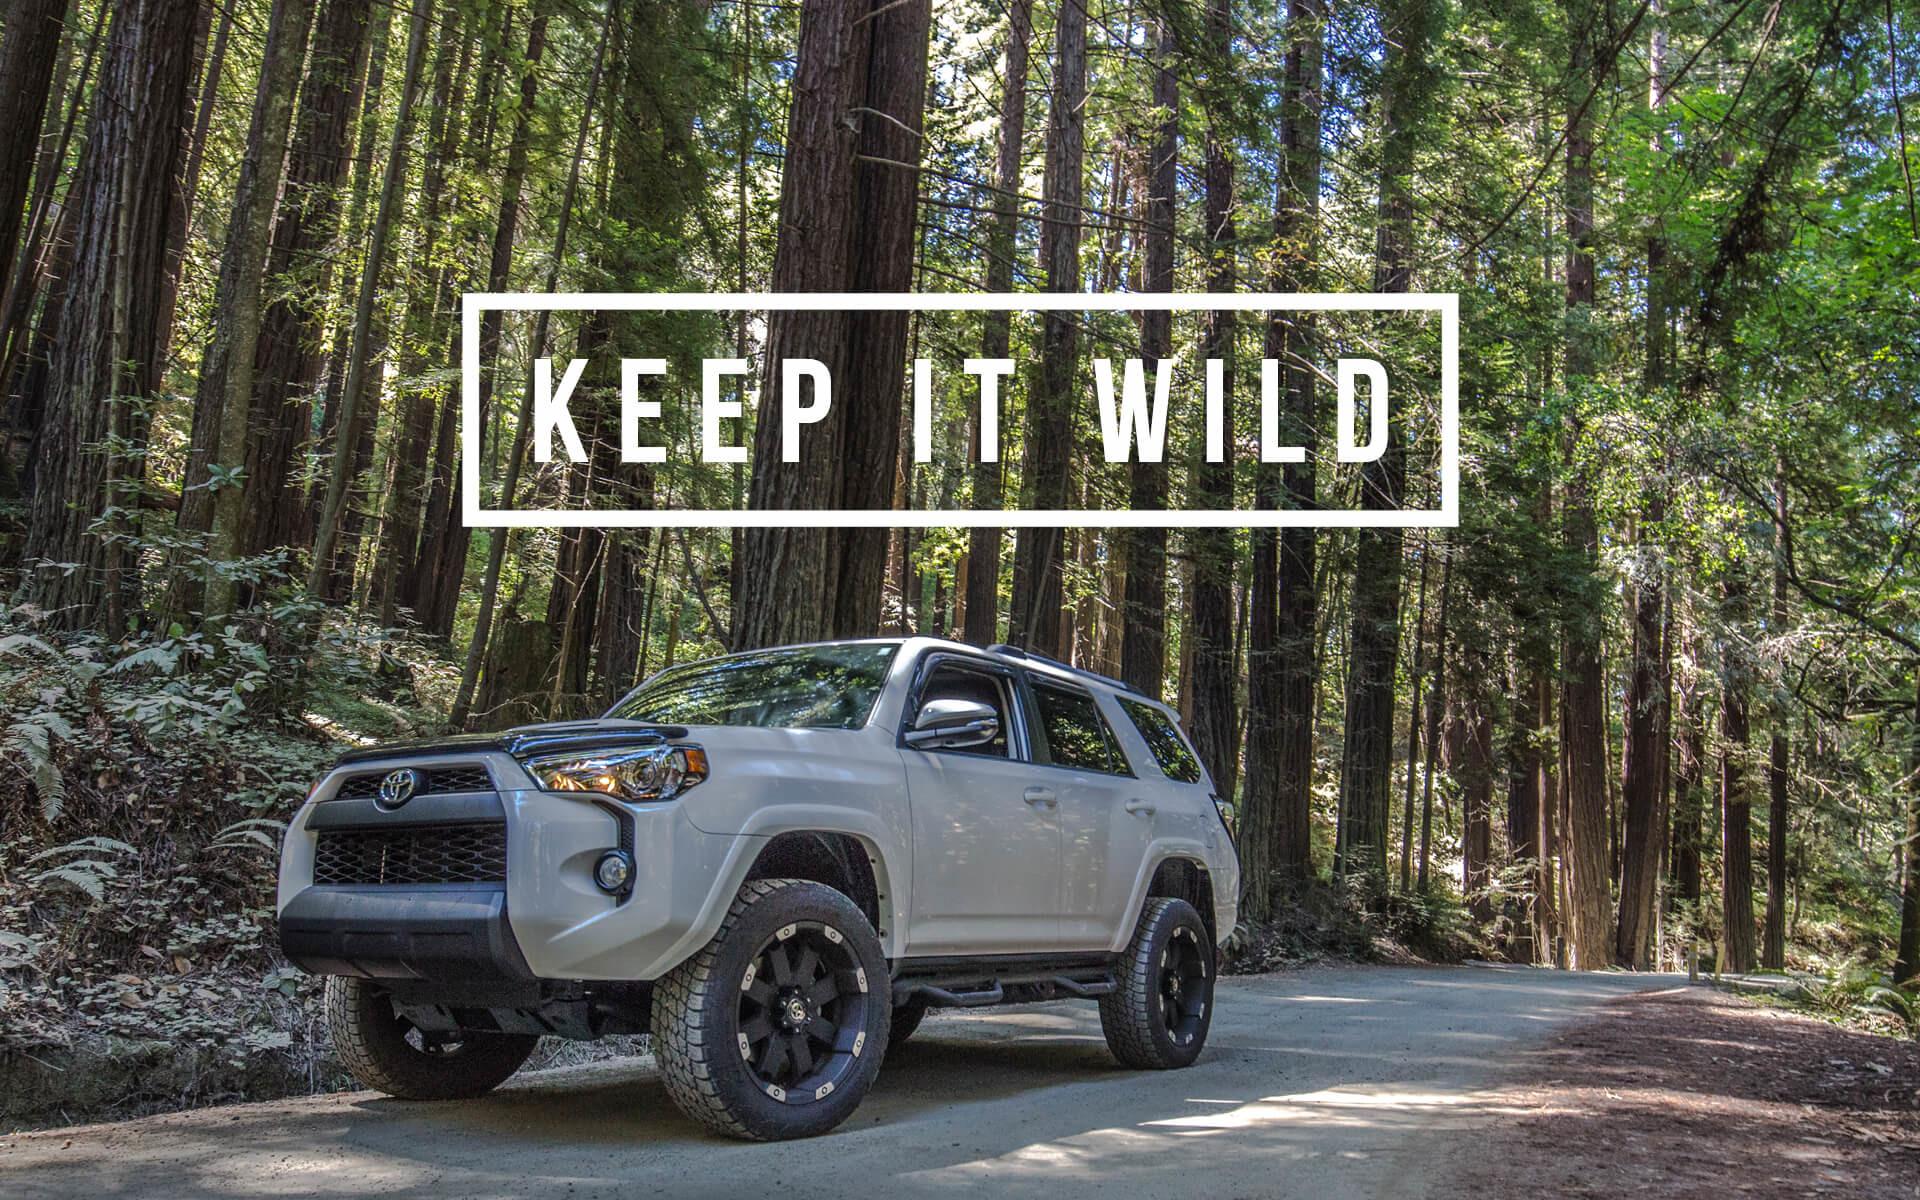 TRD PRO Wallpaper Background – Keep It Wild